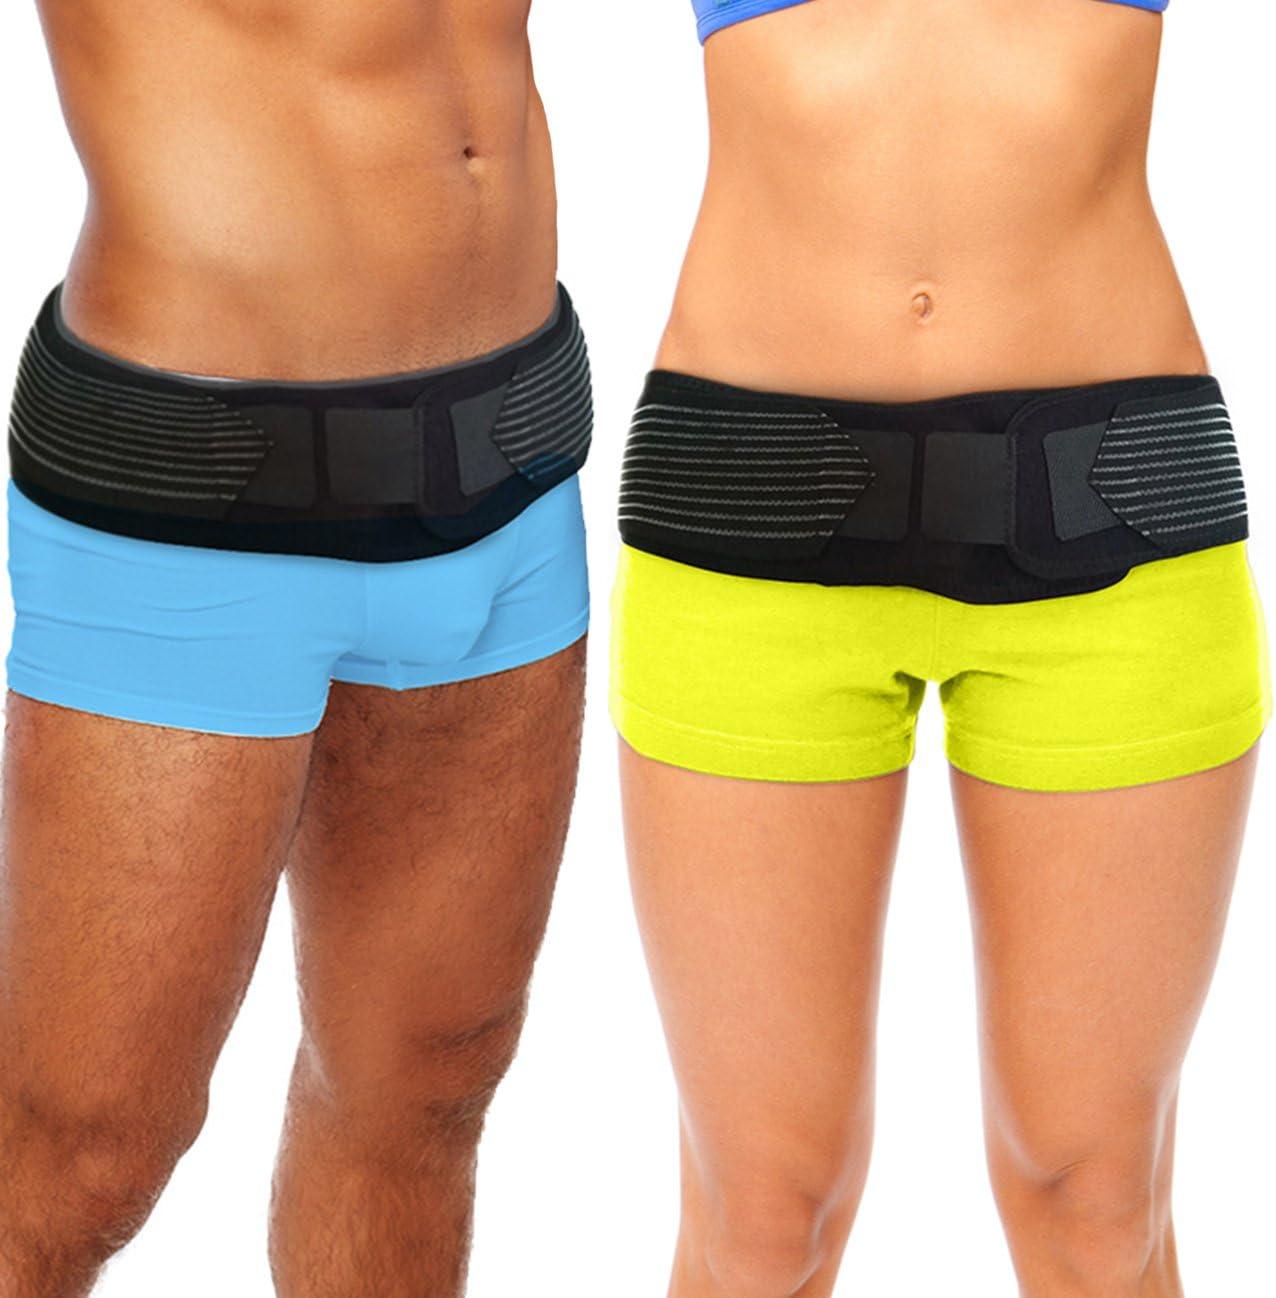 SI Belt Hip Brace - Sacroiliac SI Joint & Sciatica Nerve Pain Relief. Lower Back Brace for Back Support. Pelvis Hip Belt for Sciatic Nerve Pain Relief, Lower Back Brace for Men Women's Hip Pain